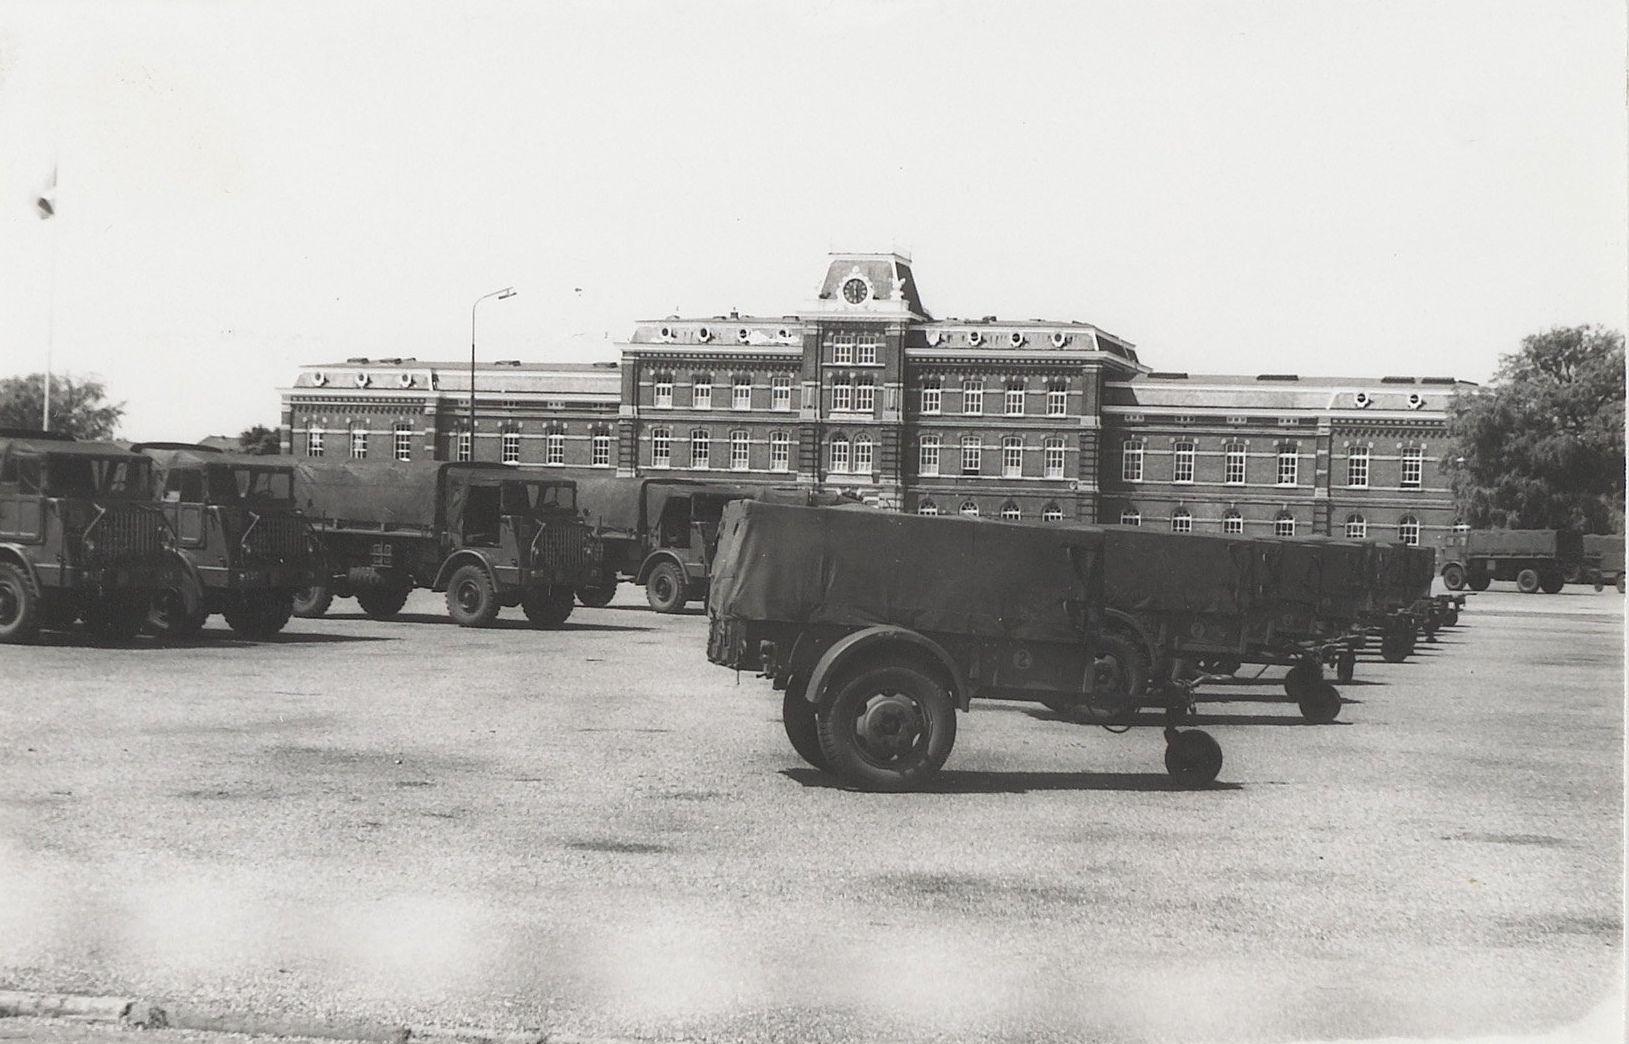 Ripperda kazerne in gebruik, 1966